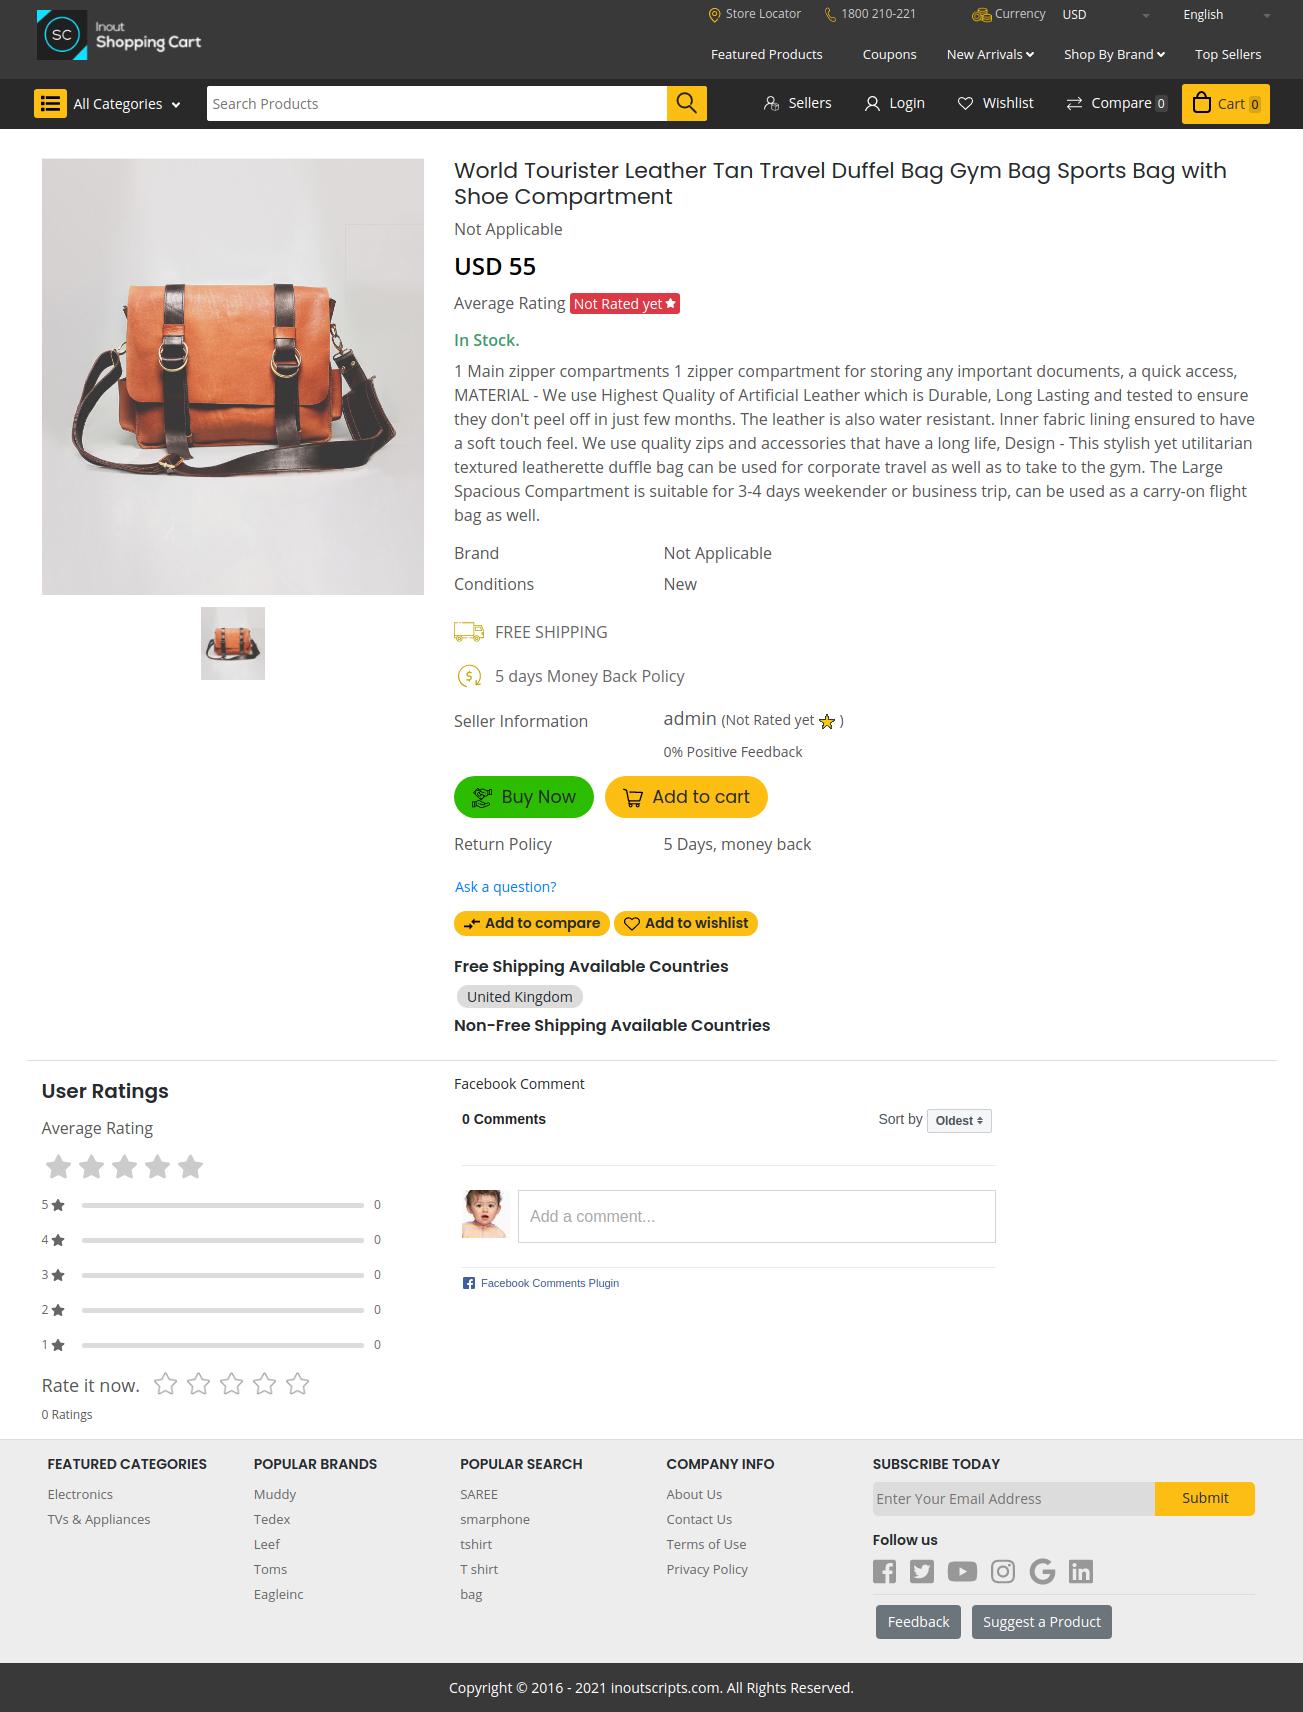 Inout Shopping Cart - Multi Vendor Edition - Screenshot 2